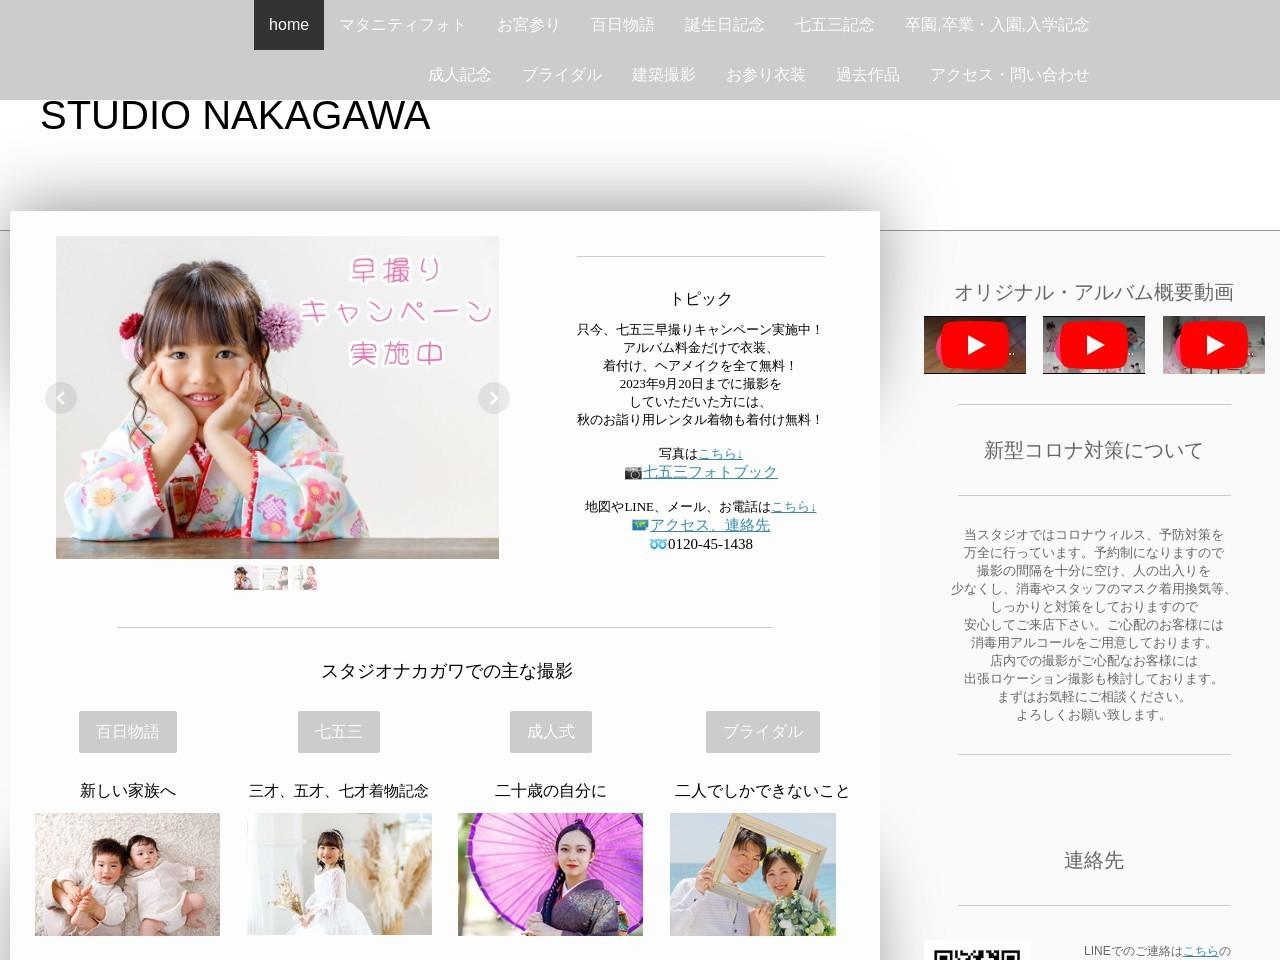 STUDIO.NAKAGAWA